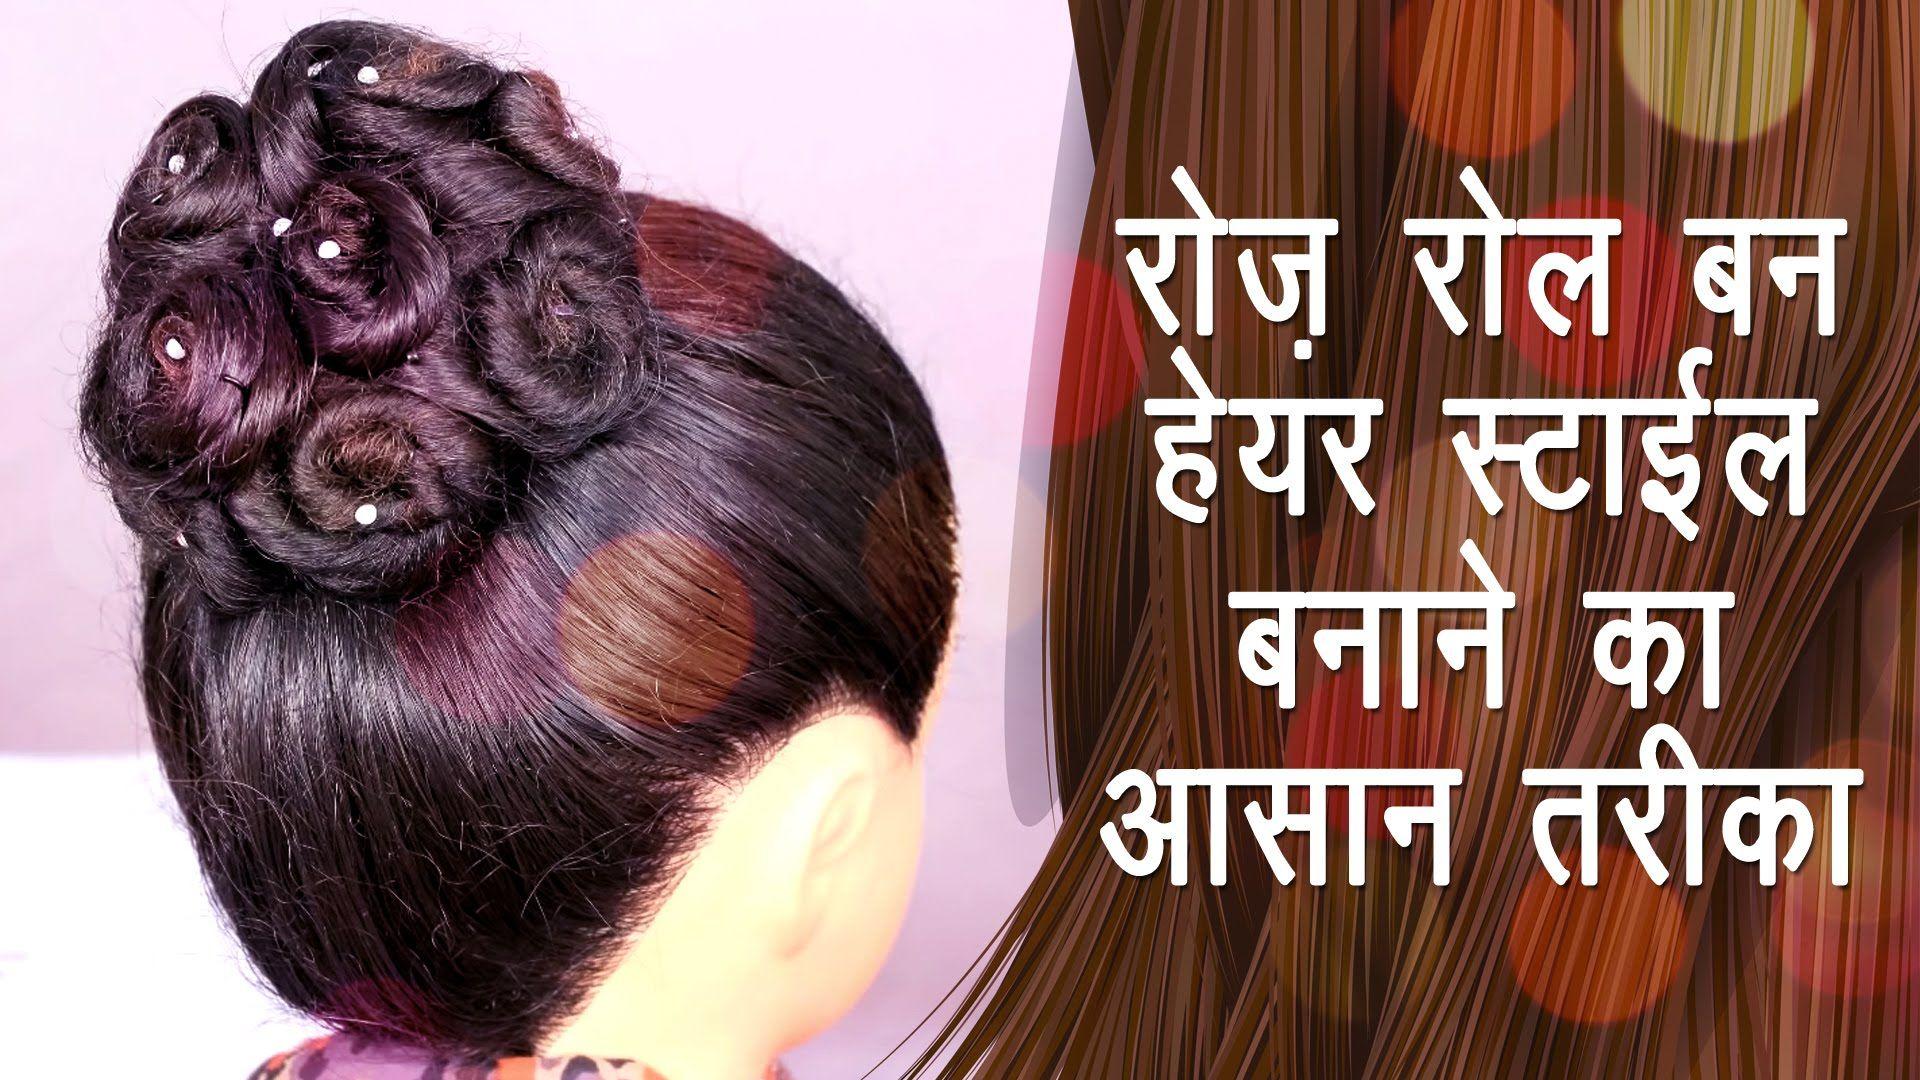 Hair Style In Hindi For Rose Roll Bun Do It Yourself Khoobsurati Studio Hair Styles Roll Hairstyle Bun Hairstyles